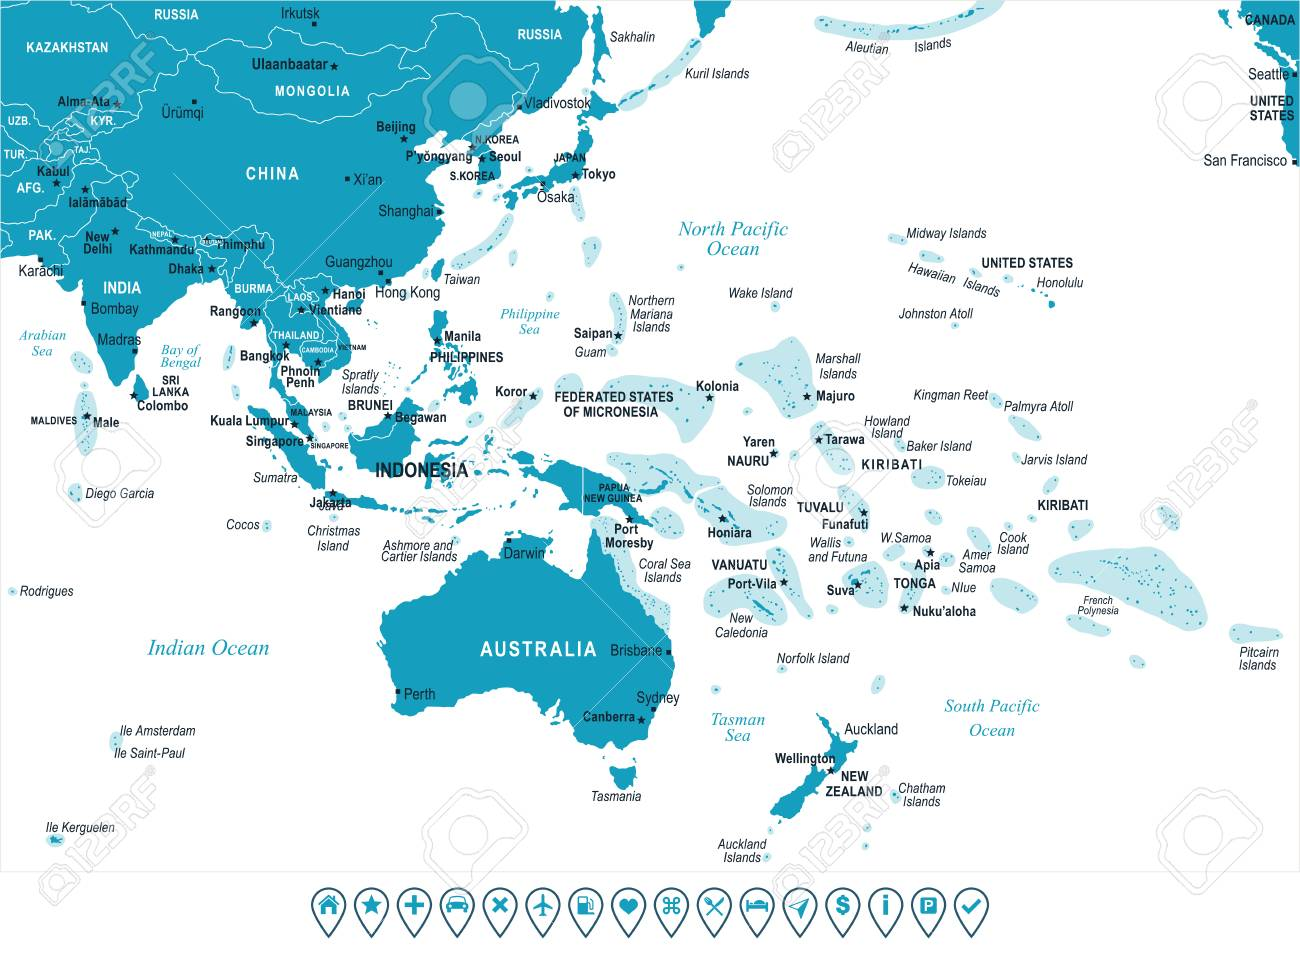 Carte Asie Oceanie.Asie Et L 39 Indonesie Carte D 39 Oceanie Detaillee Illustration